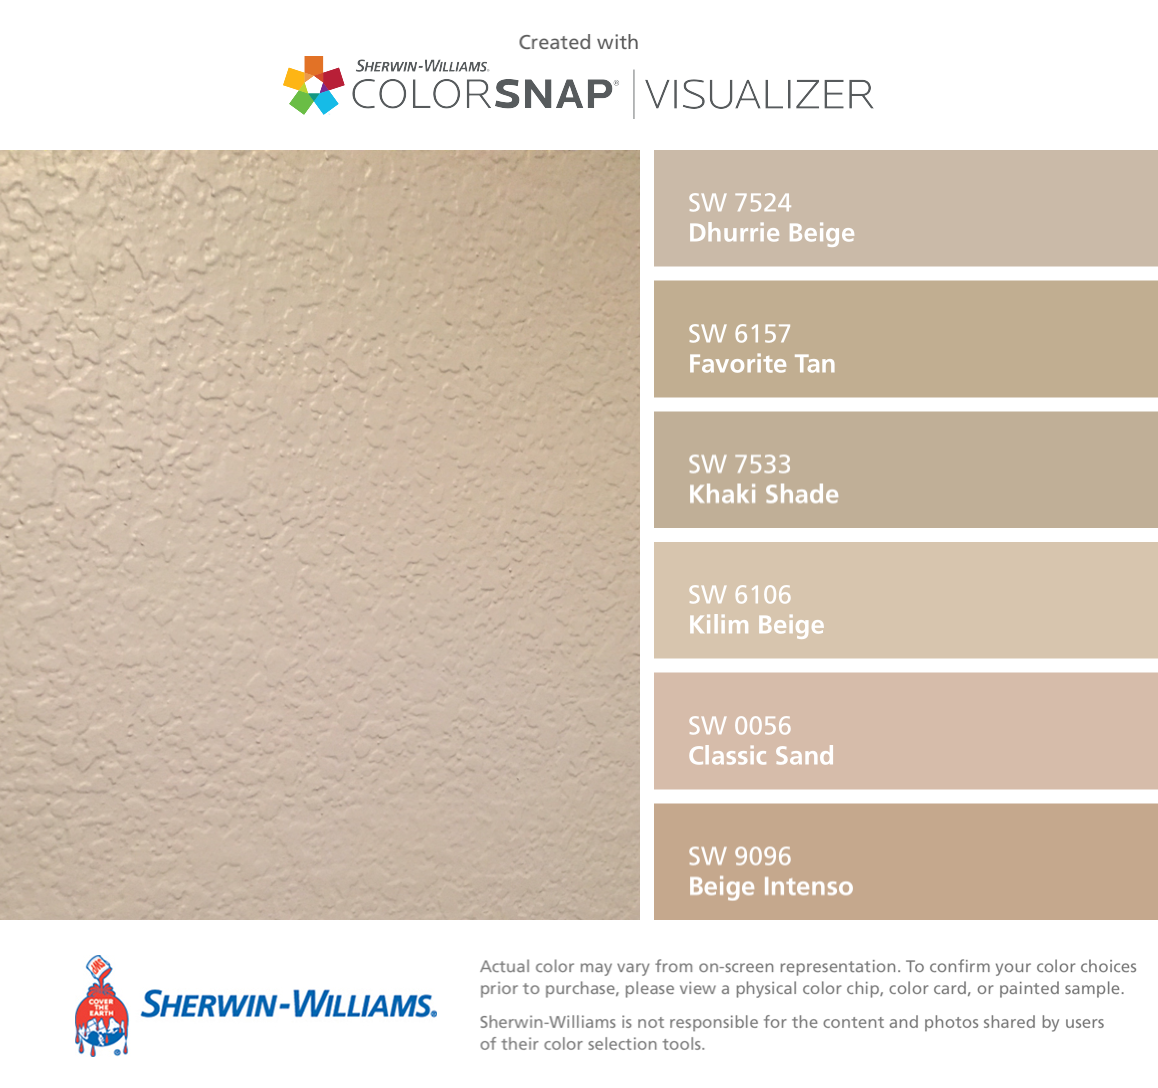 Sherwin Williams Color Favorites: GP Apt Sherwin-Williams: Dhurrie Beige (SW 7524), Favorite